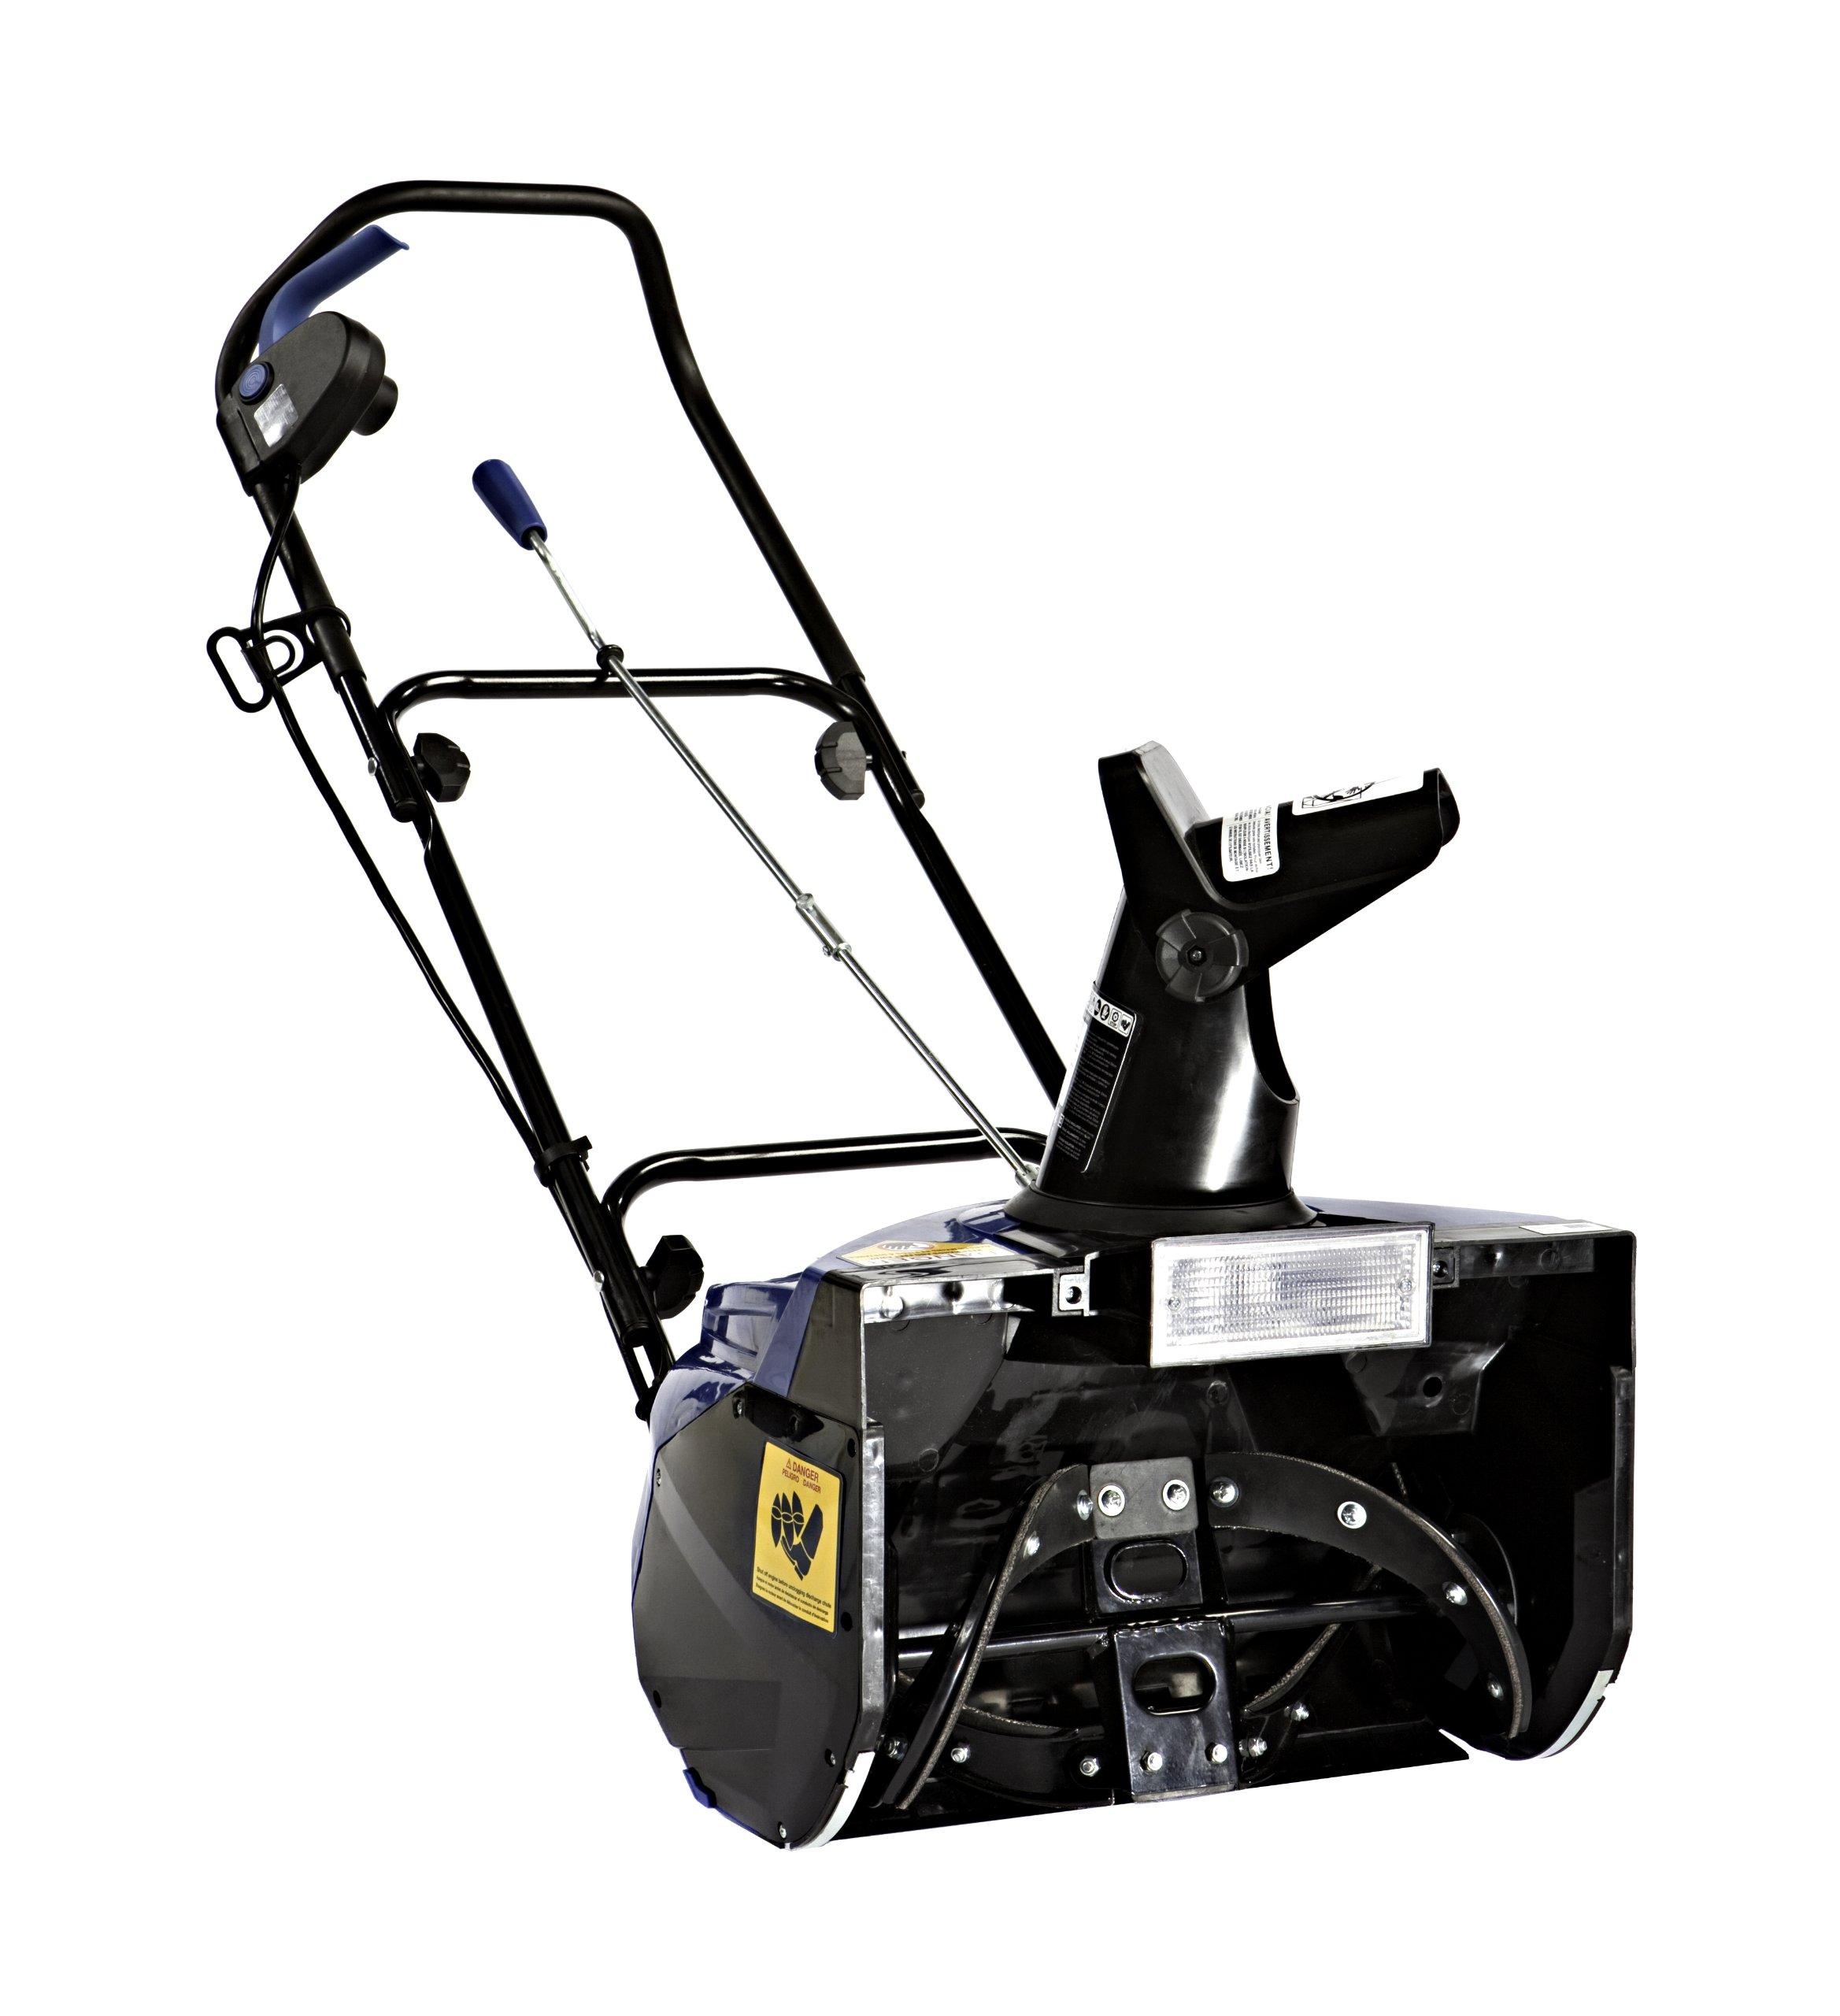 Snow Joe SJ621-RM Electric Single Stage Snow Thrower | 18-Inch | 13.5 Amp Motor | Headlights (Renewed) by Snow Joe